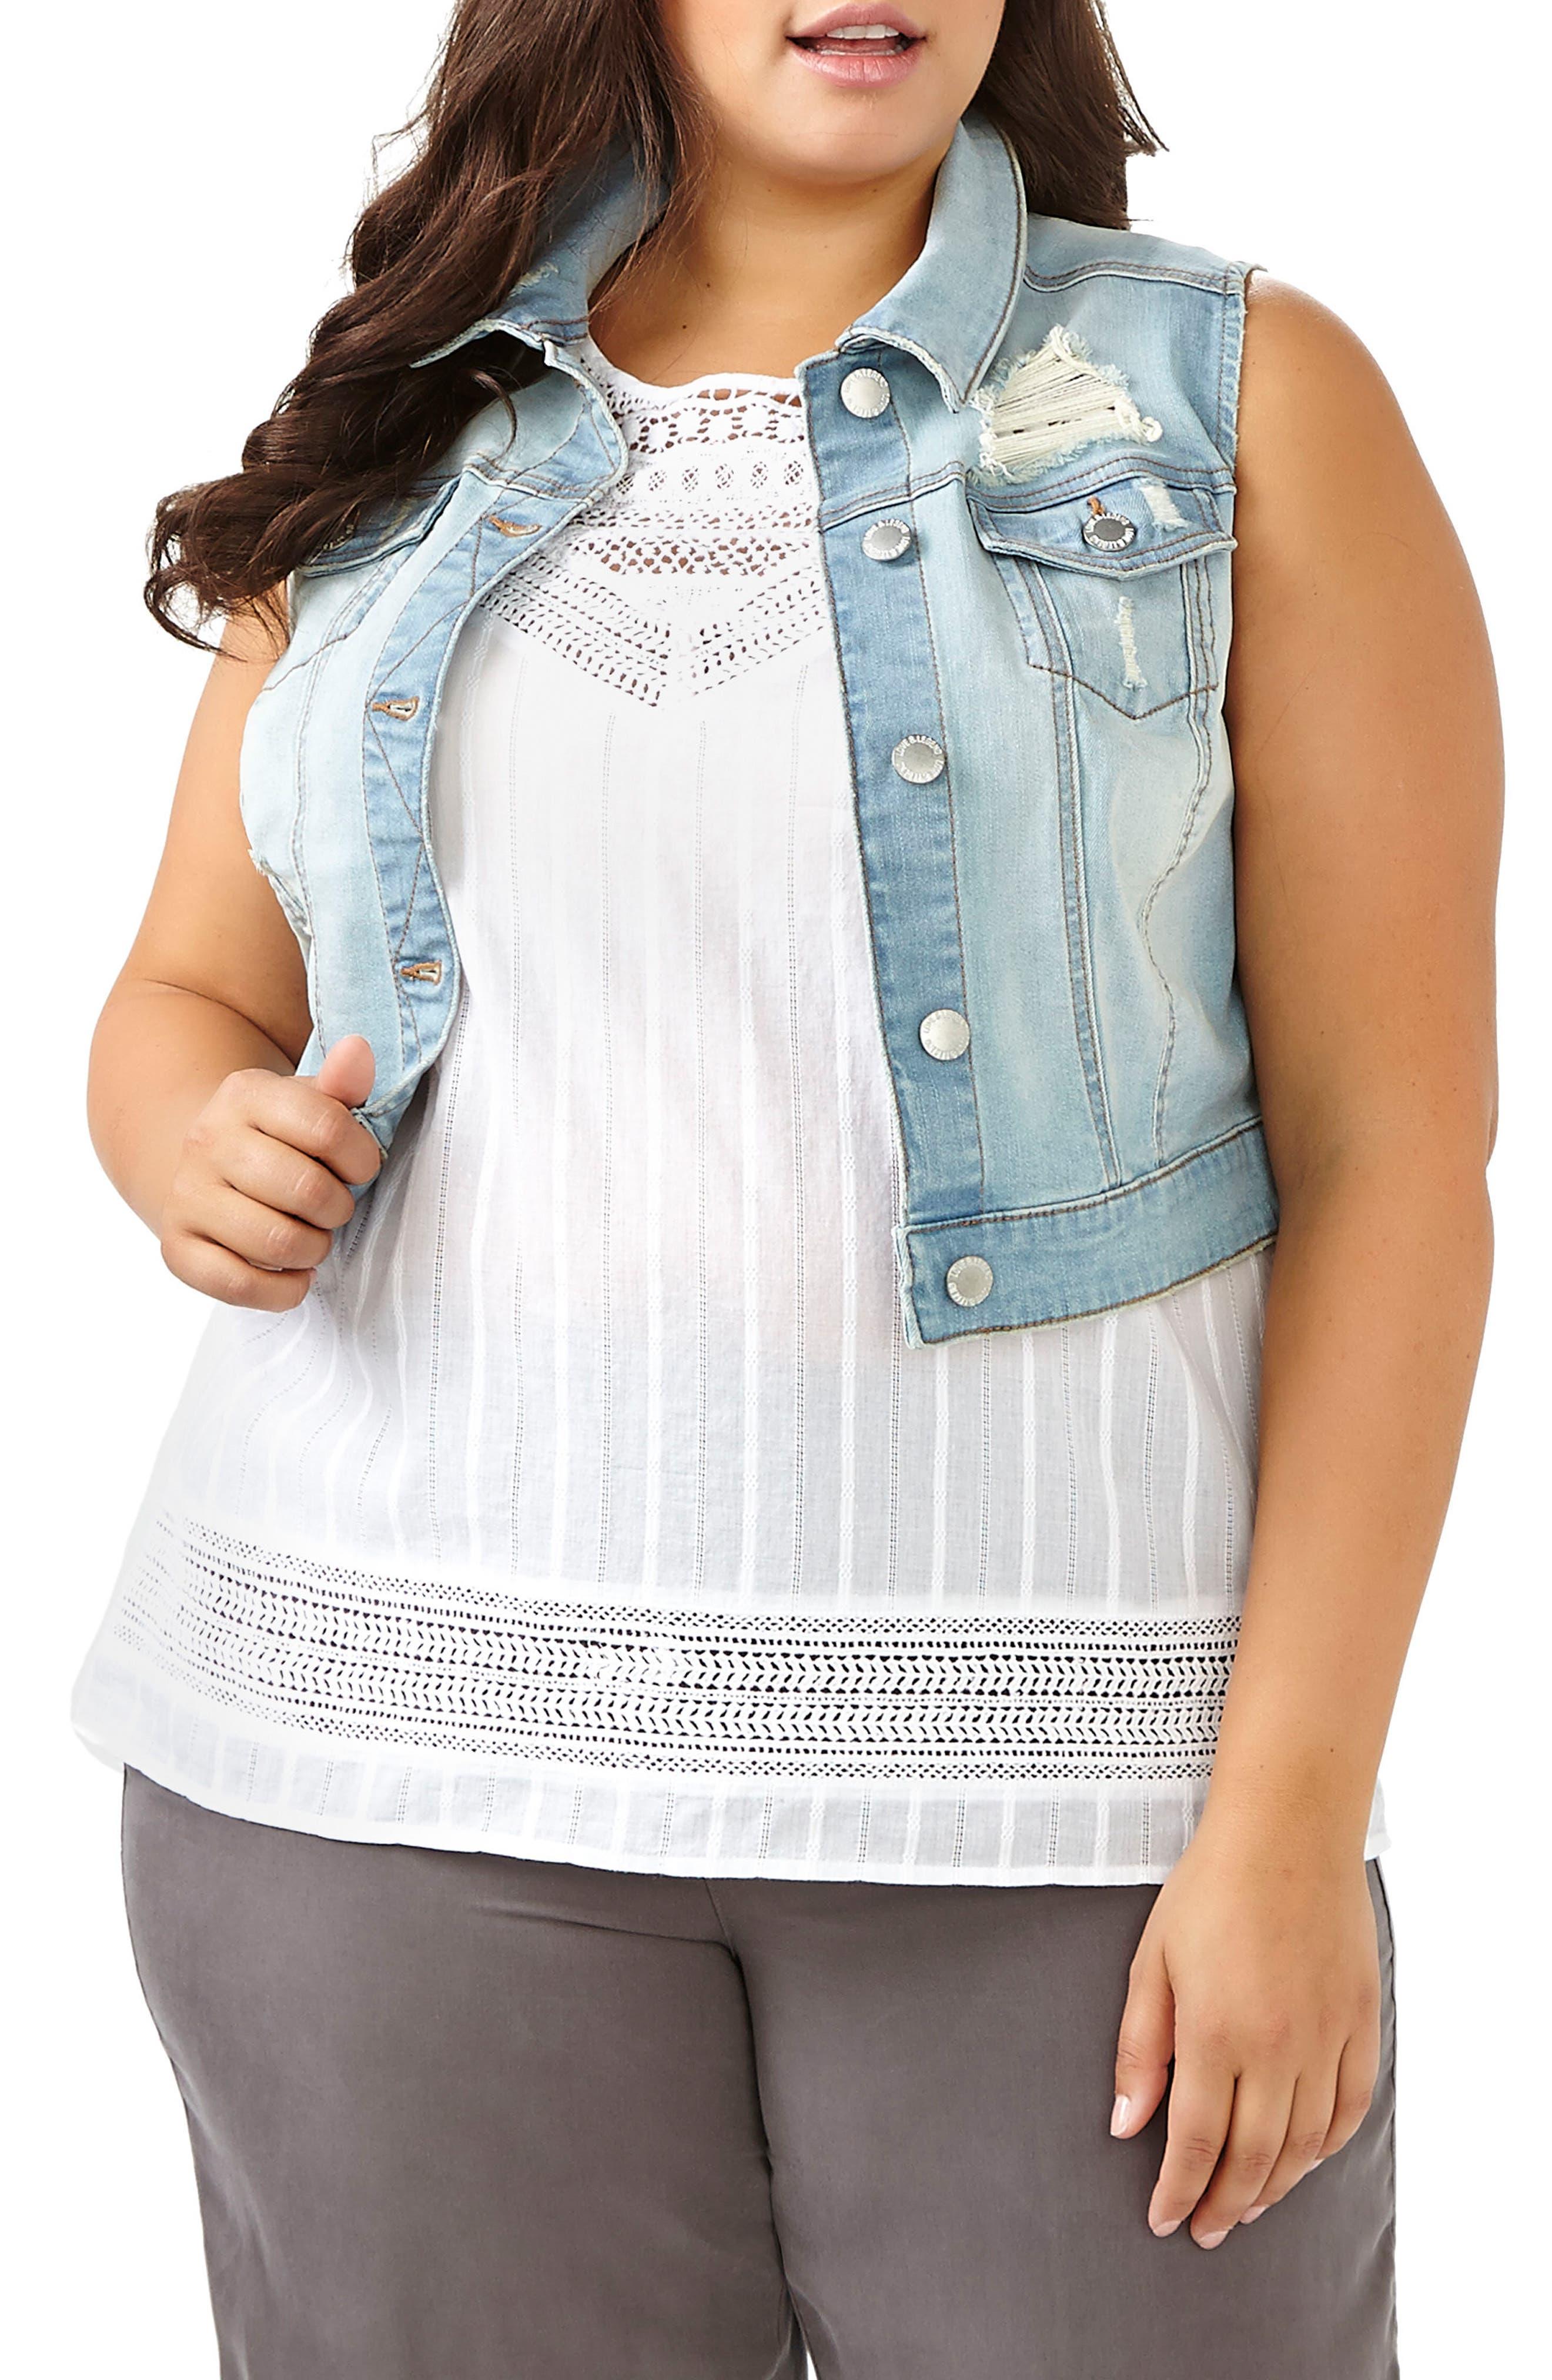 ADDITION ELLE LOVE AND LEGEND Distressed Crop Denim Vest (Plus Size) - ADDITION ELLE LOVE & LEGEND